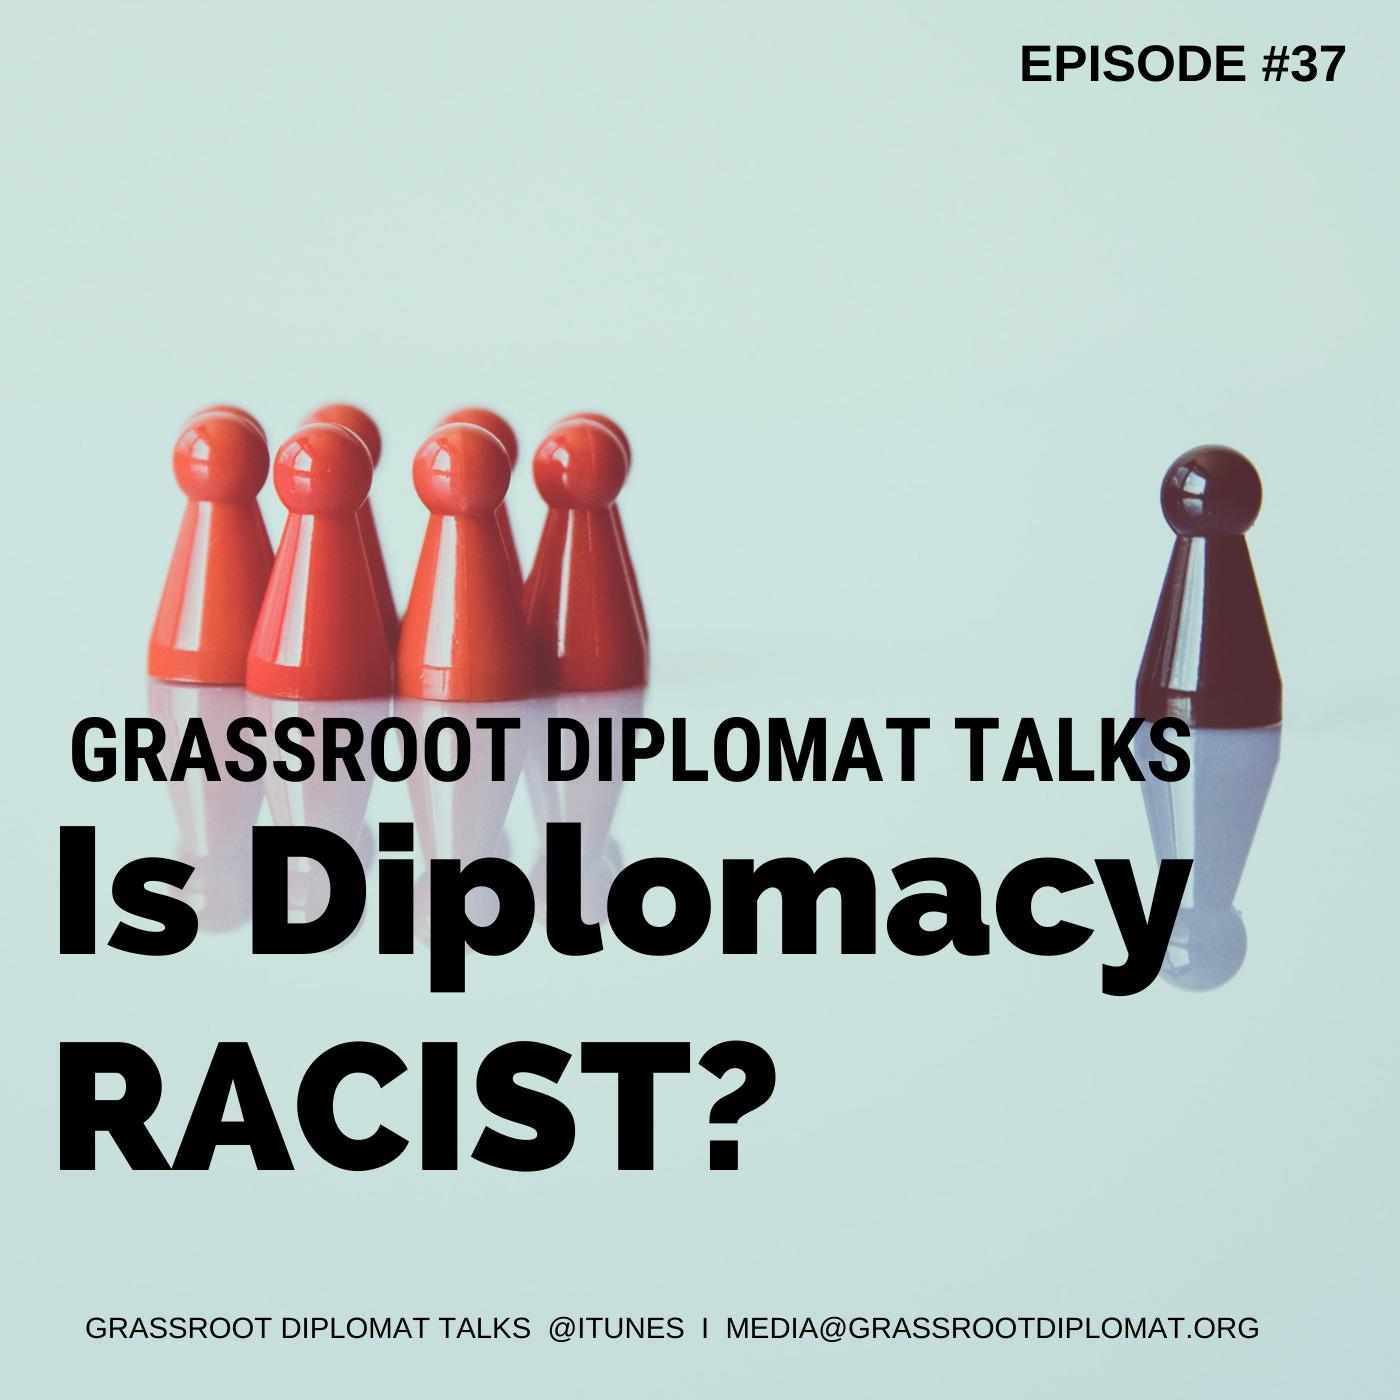 Is diplomacy racist?